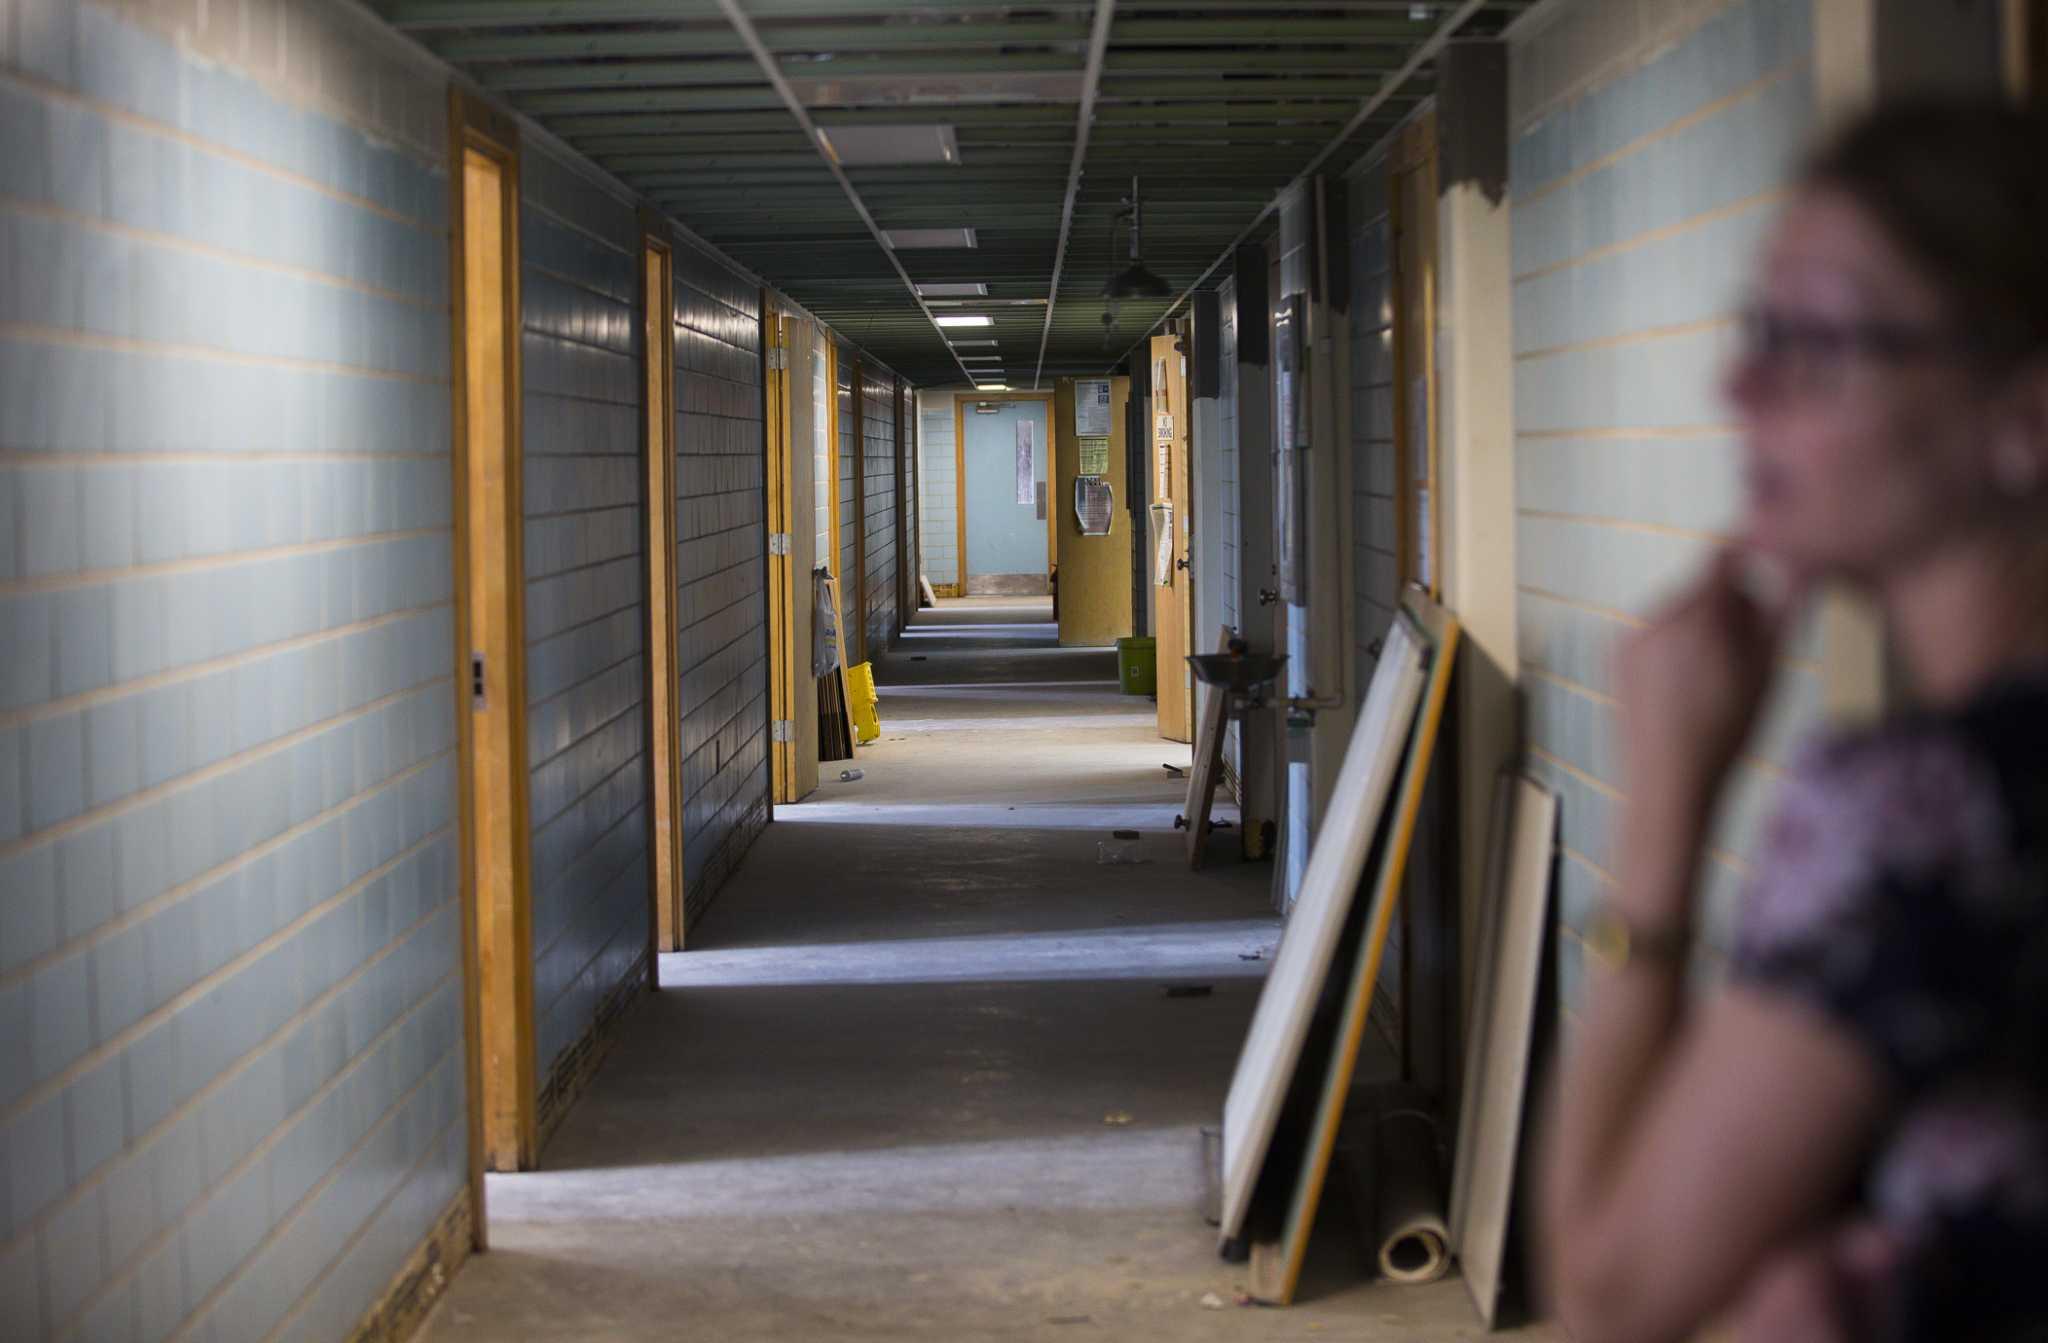 UT-Austin's Marine Science Institute 45 percent rebuilt after Hurricane Harvey